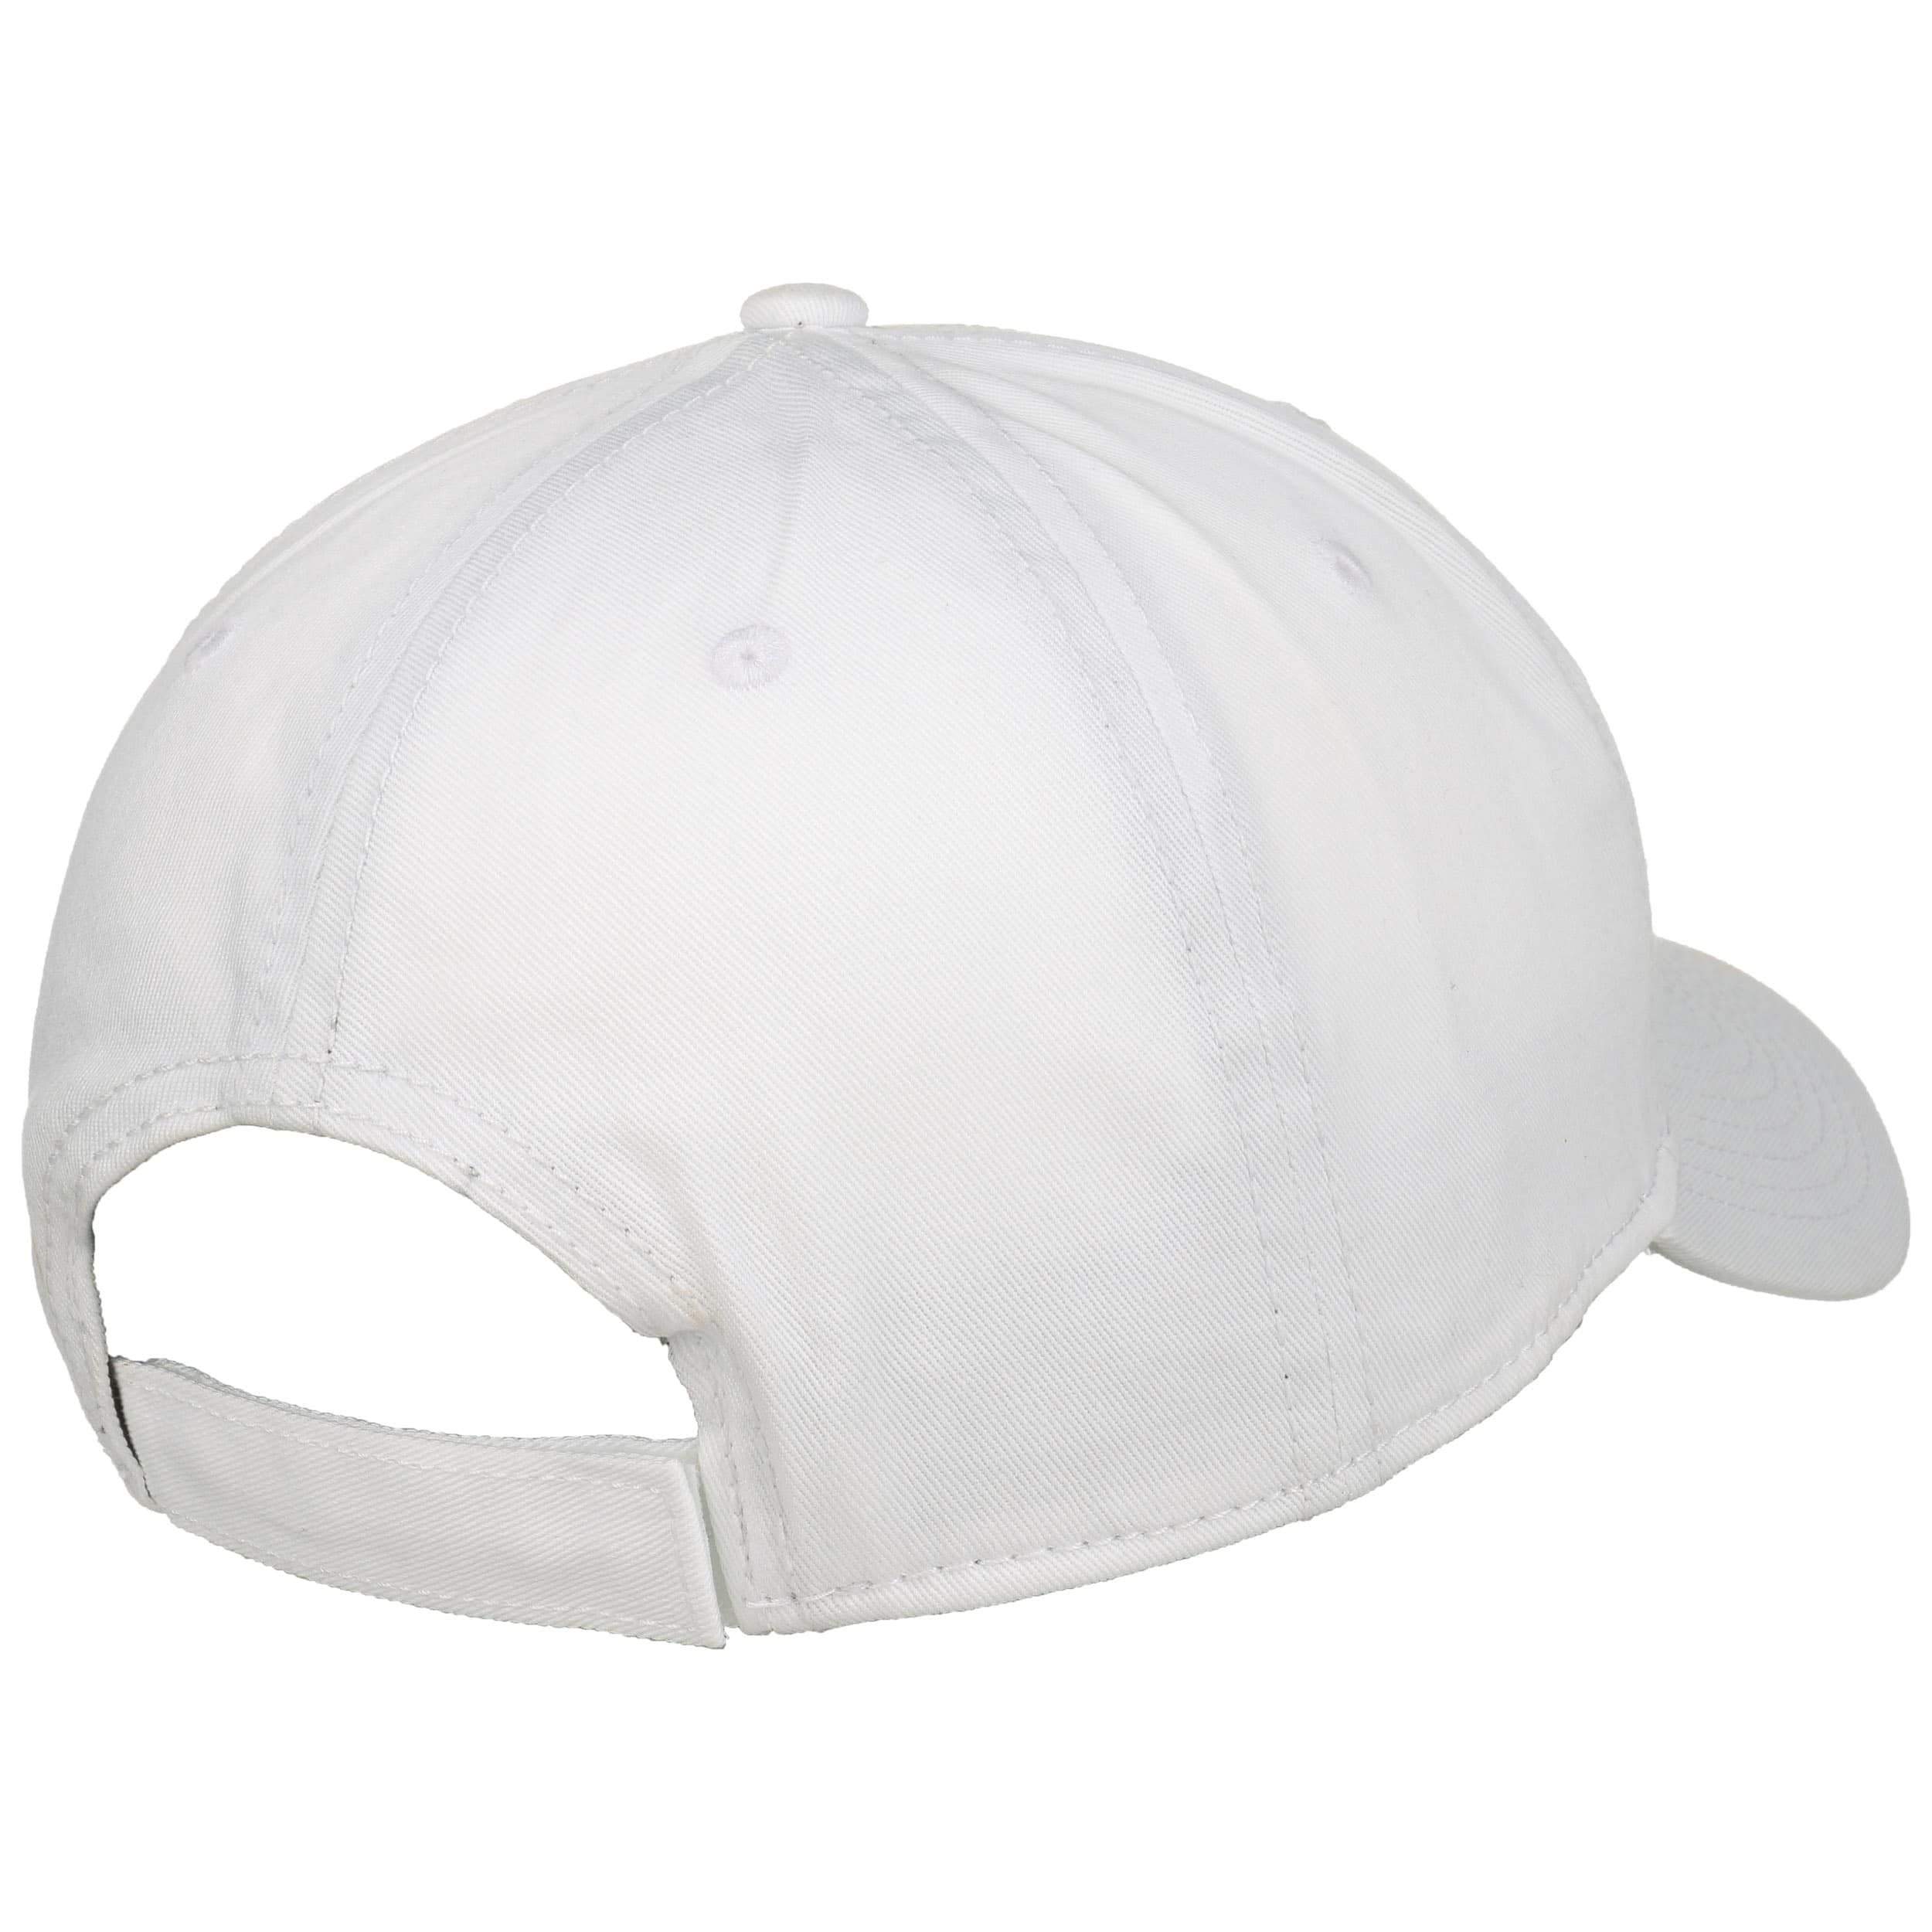 ... 9Forty Basic Strapback Cap by New Era - white 3 ... 7c882e7416a6